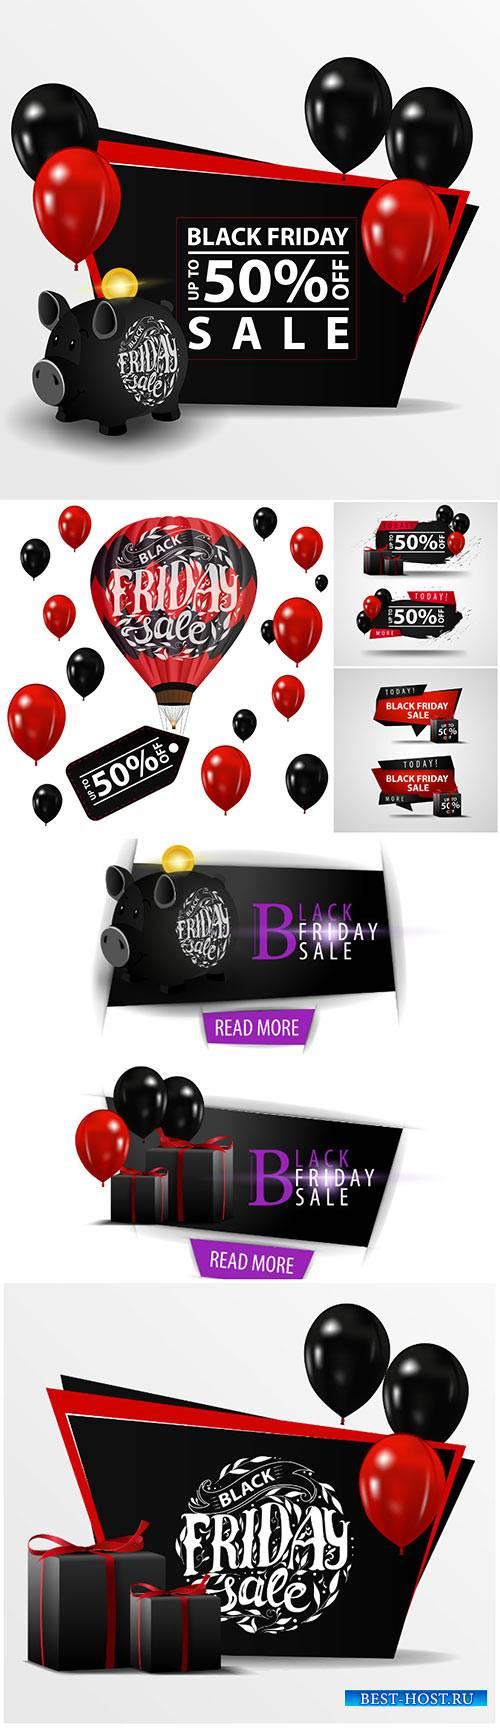 Black Friday sale vector banner with black piggy bank